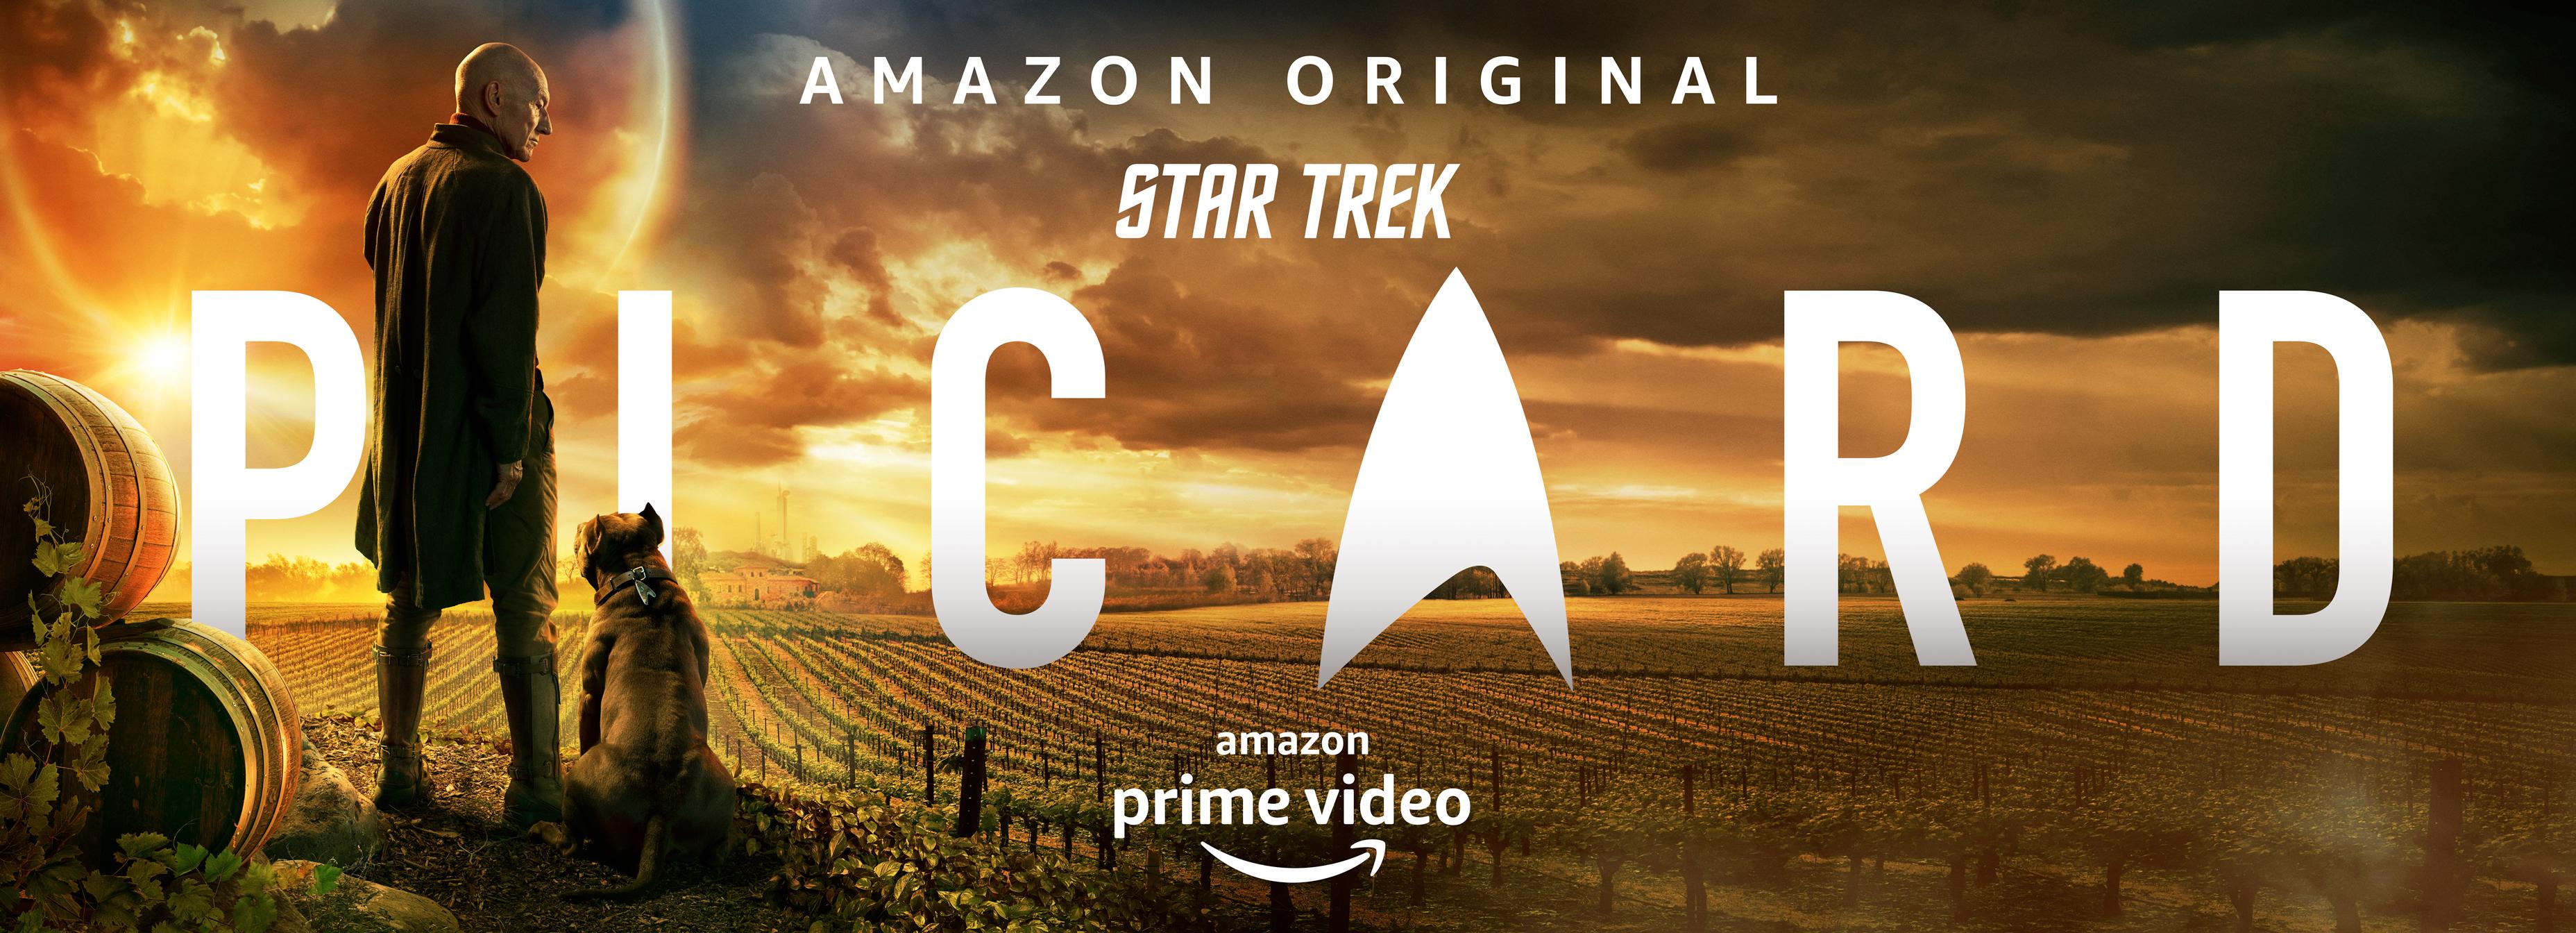 Sir Patrick Stewart en póster y teaser de Star Trek: Picard de Amazon Prime Video